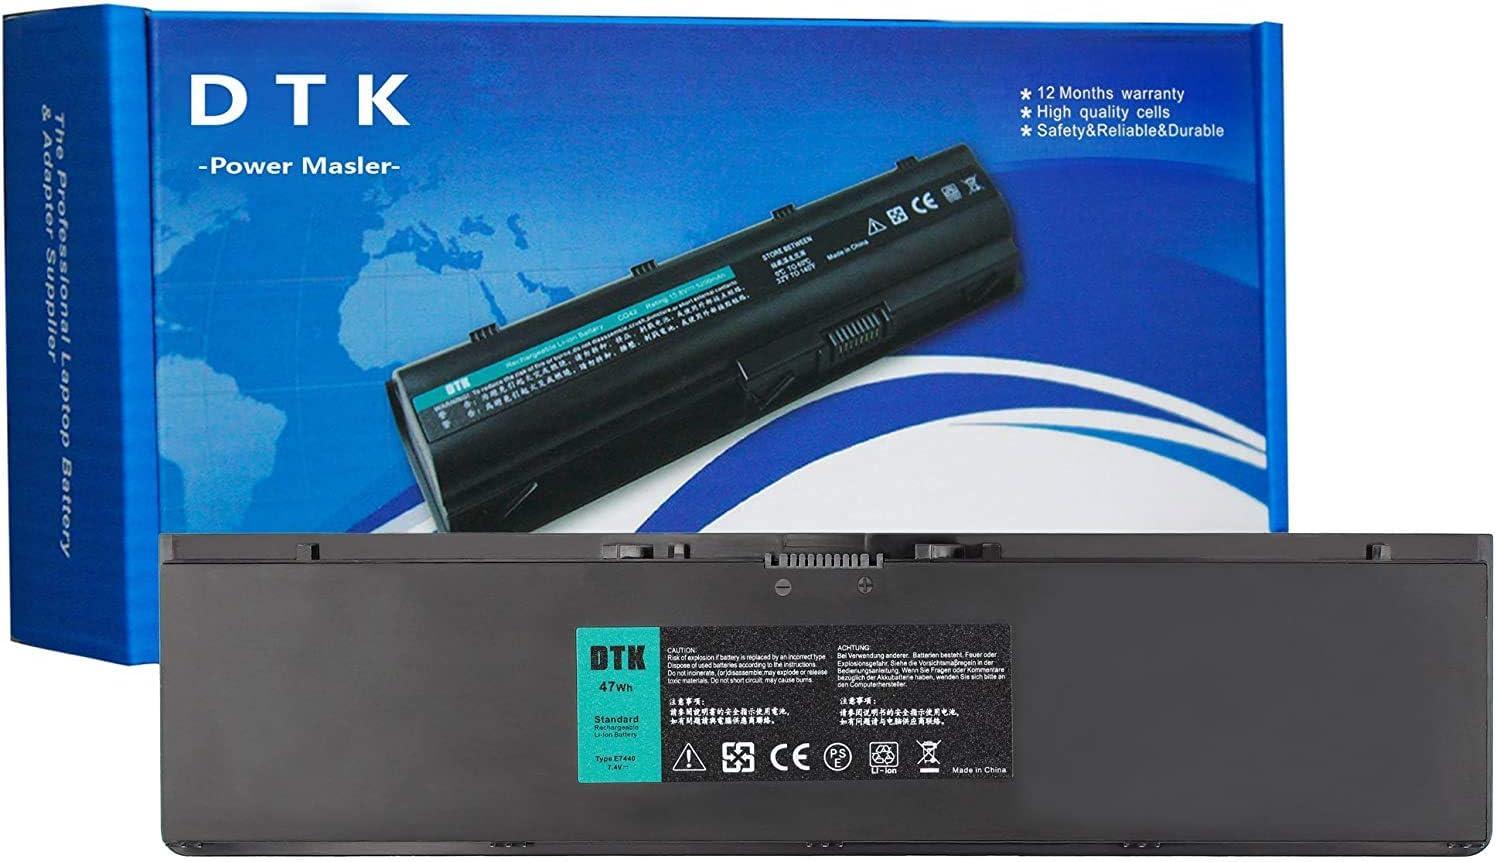 DTK 34GKR G0G2M 451-BBFV 7.4V 47Wh Laptop Replacement Battery for DELL Latitude 14 7000 Series E7420 E7440 E7450 Notebook 4 Cells